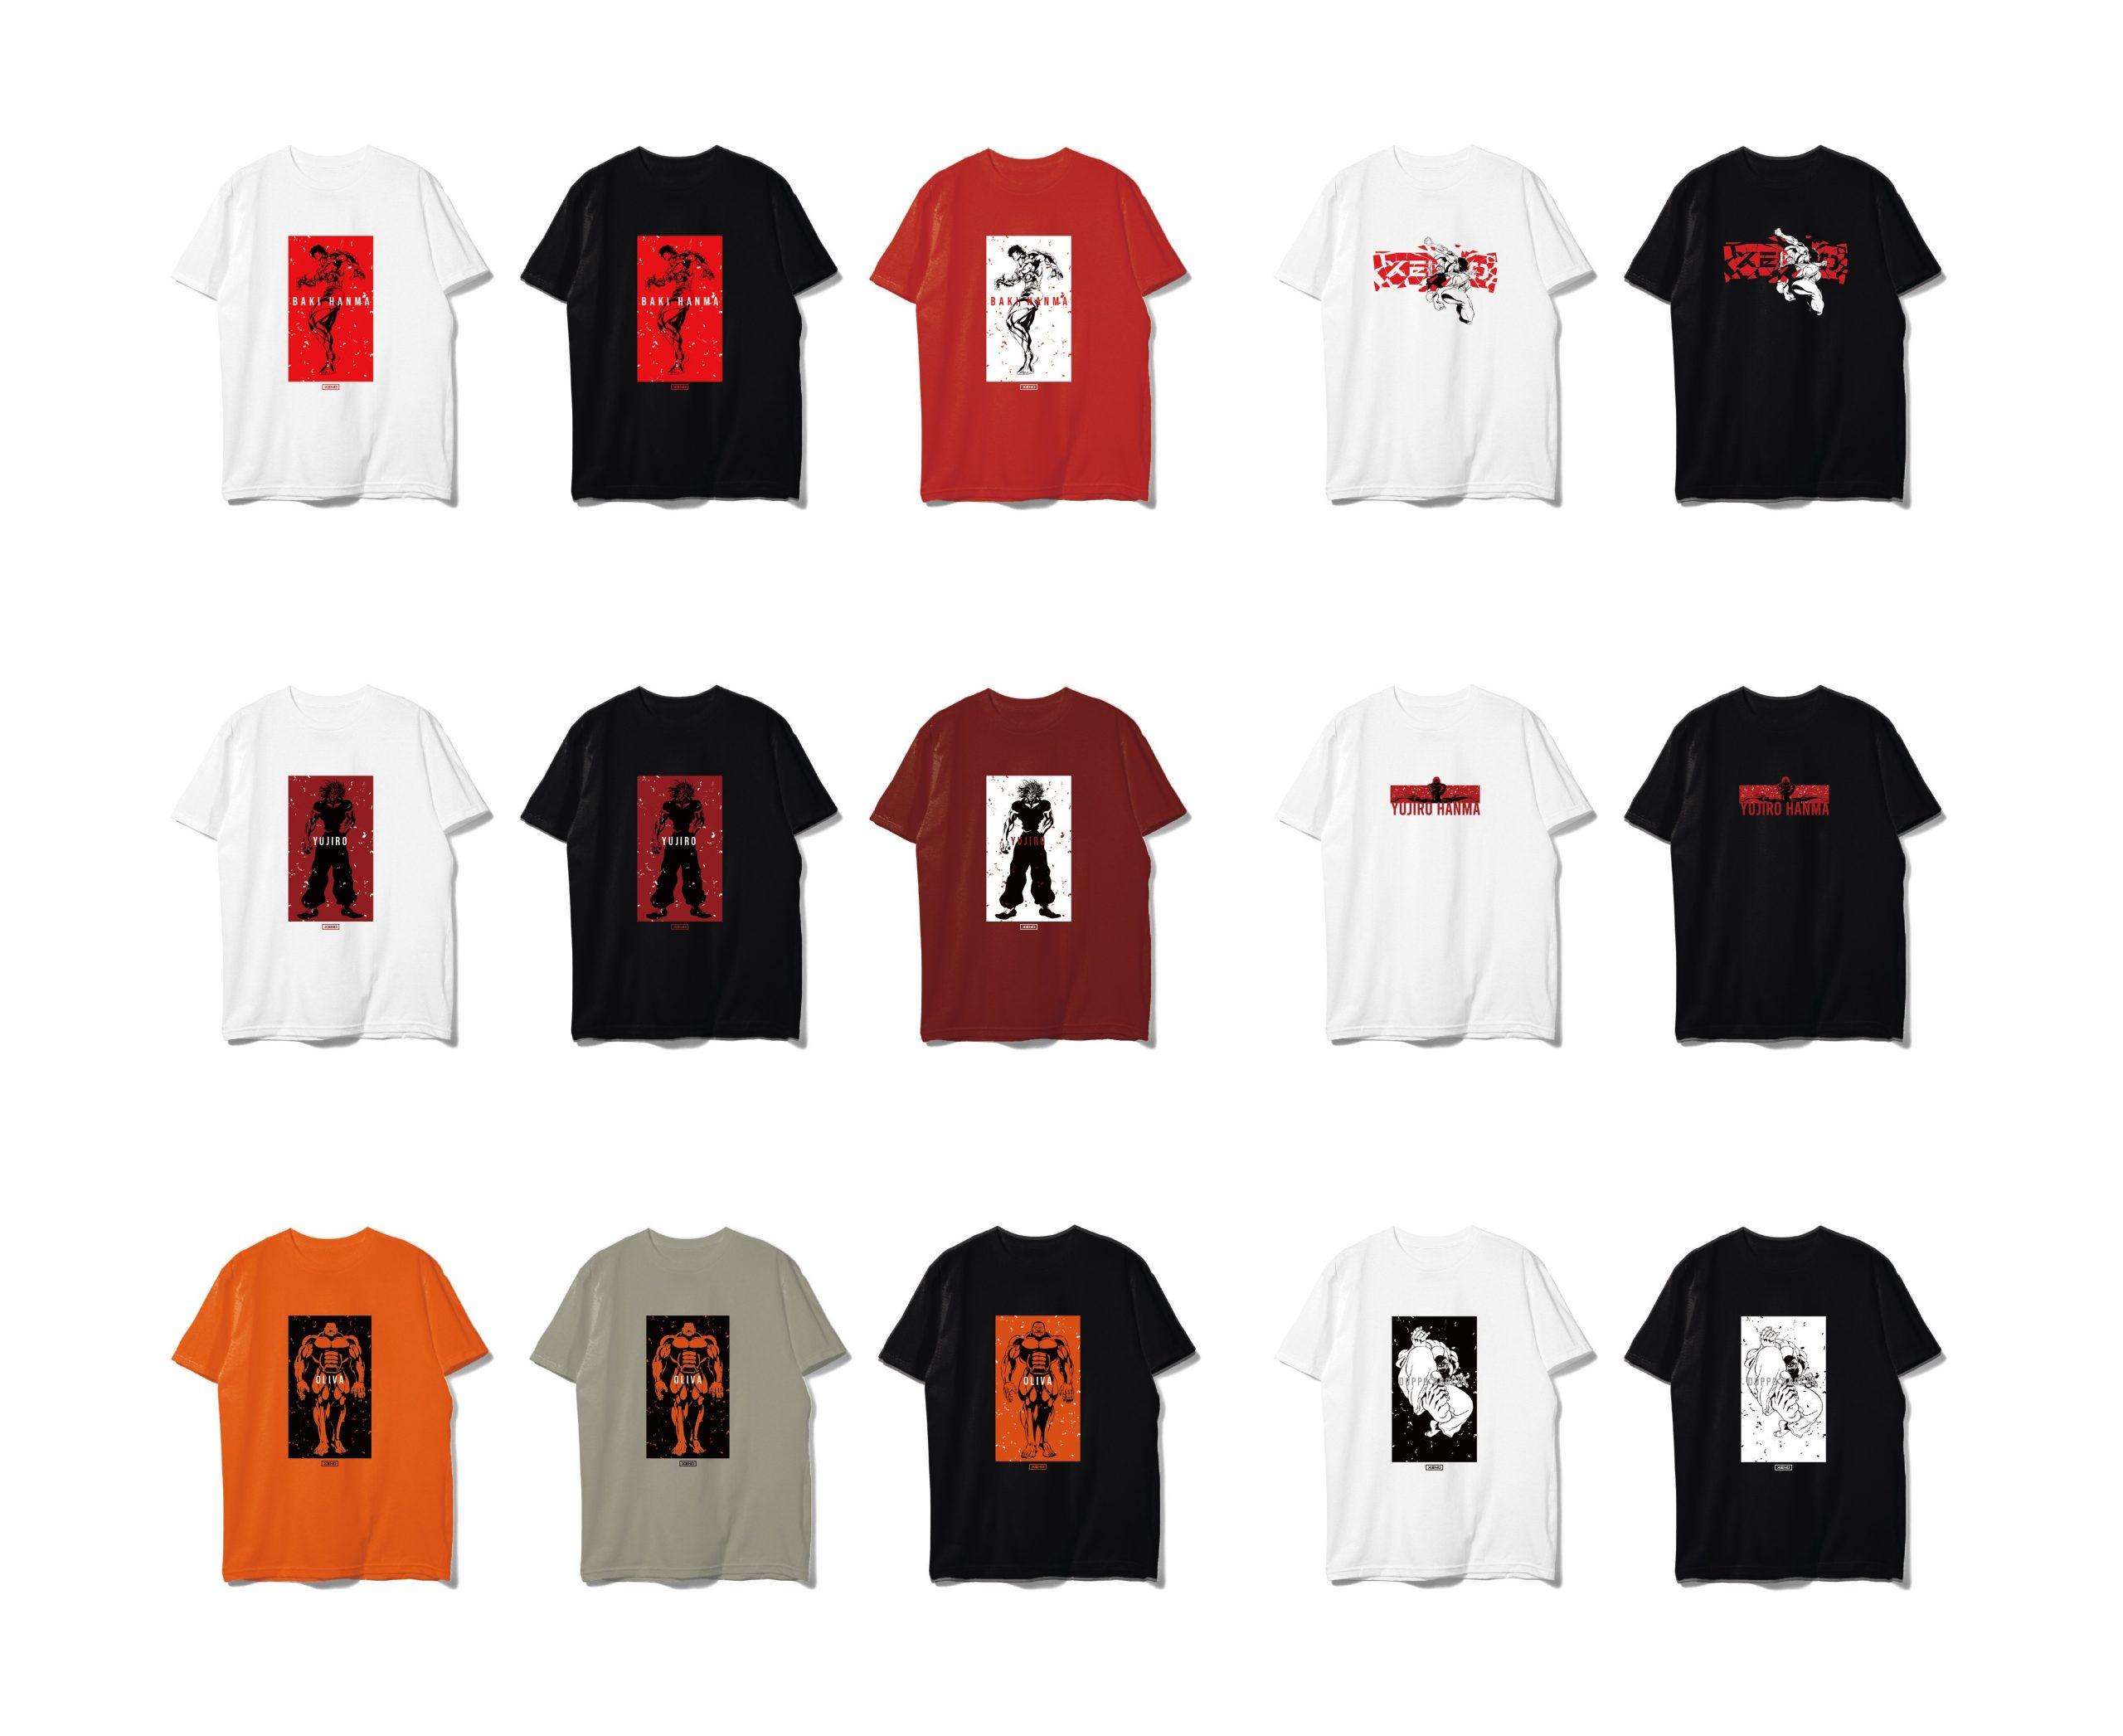 XENO×BAKI Collaboration T-shirt